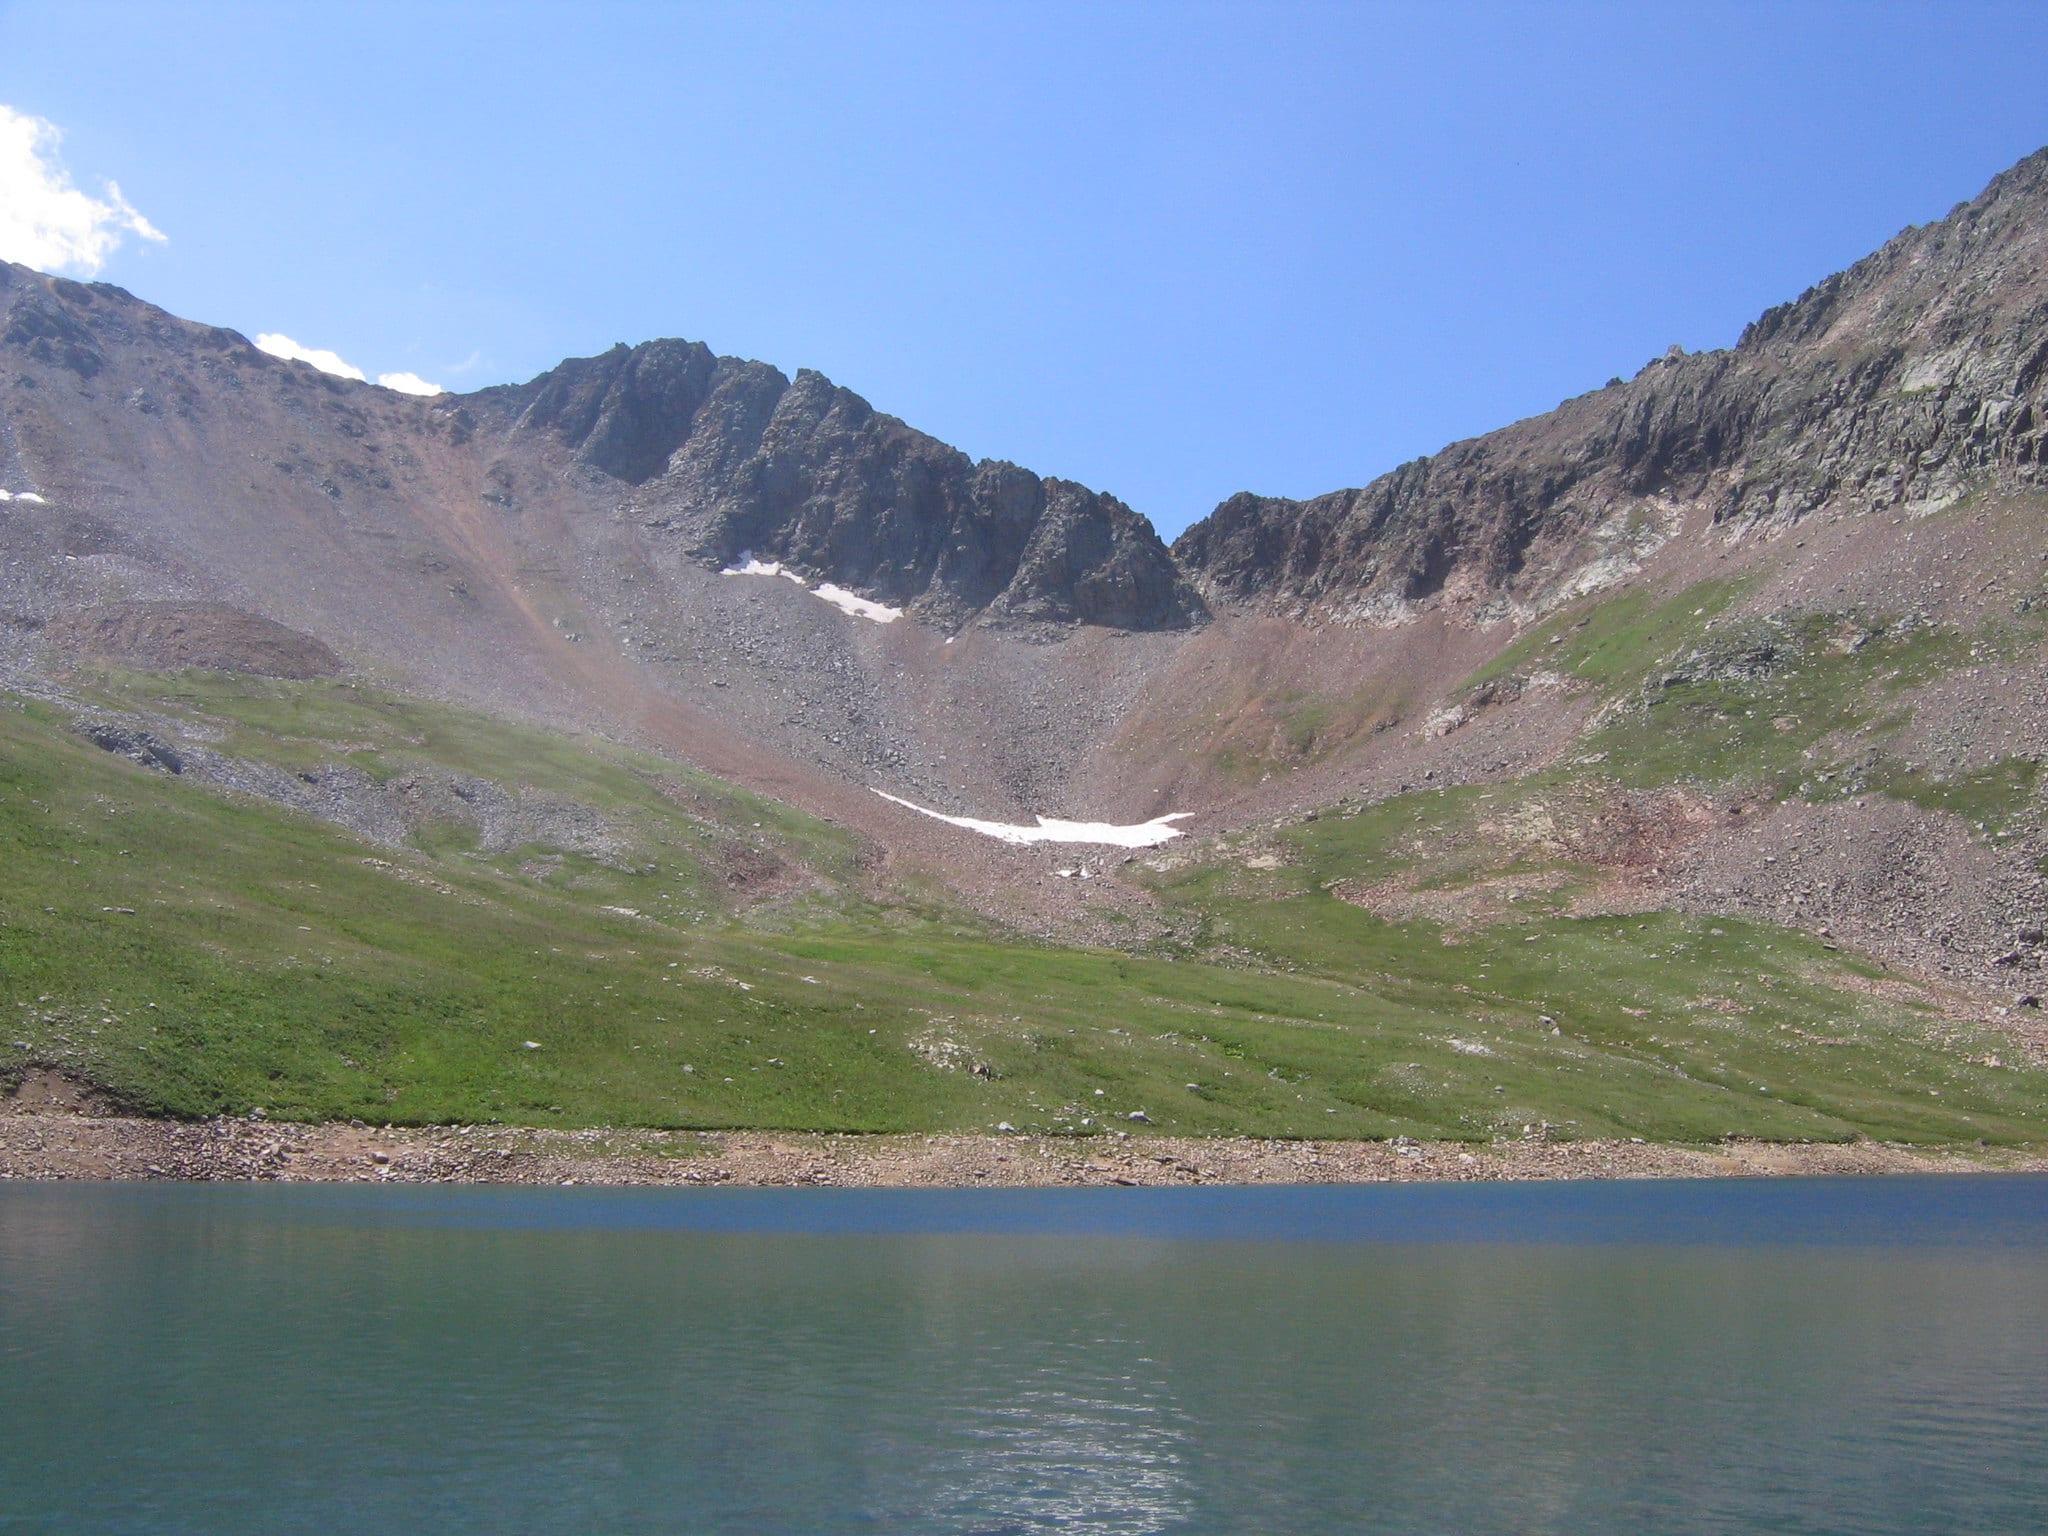 image of hope lake